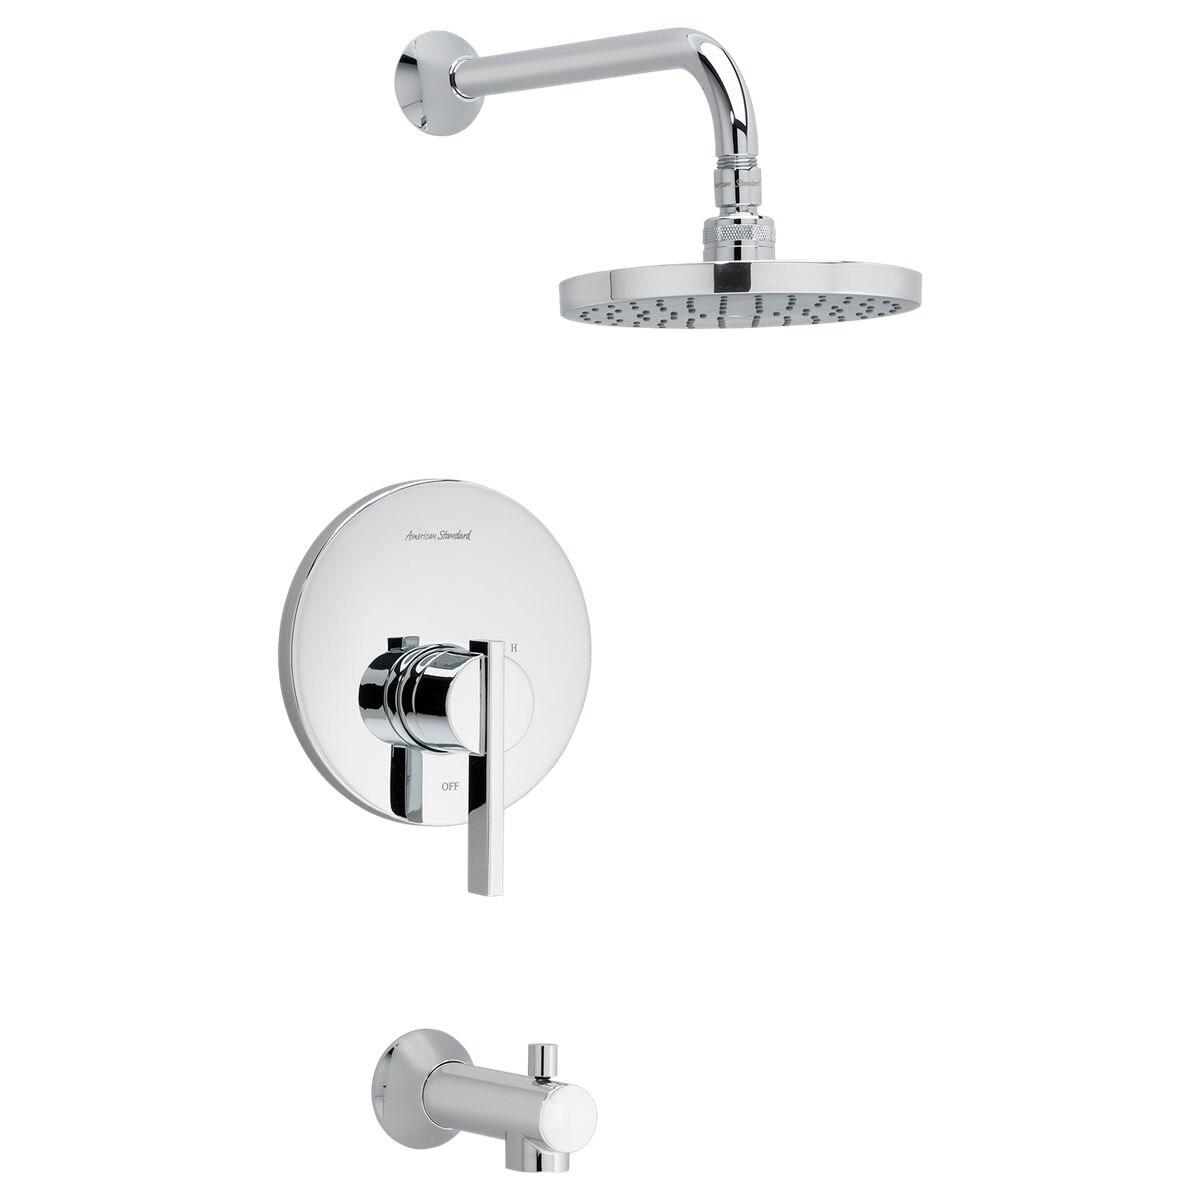 American Standard Berwick Bath Shower Faucet Trim Kit T430.502.002 ...